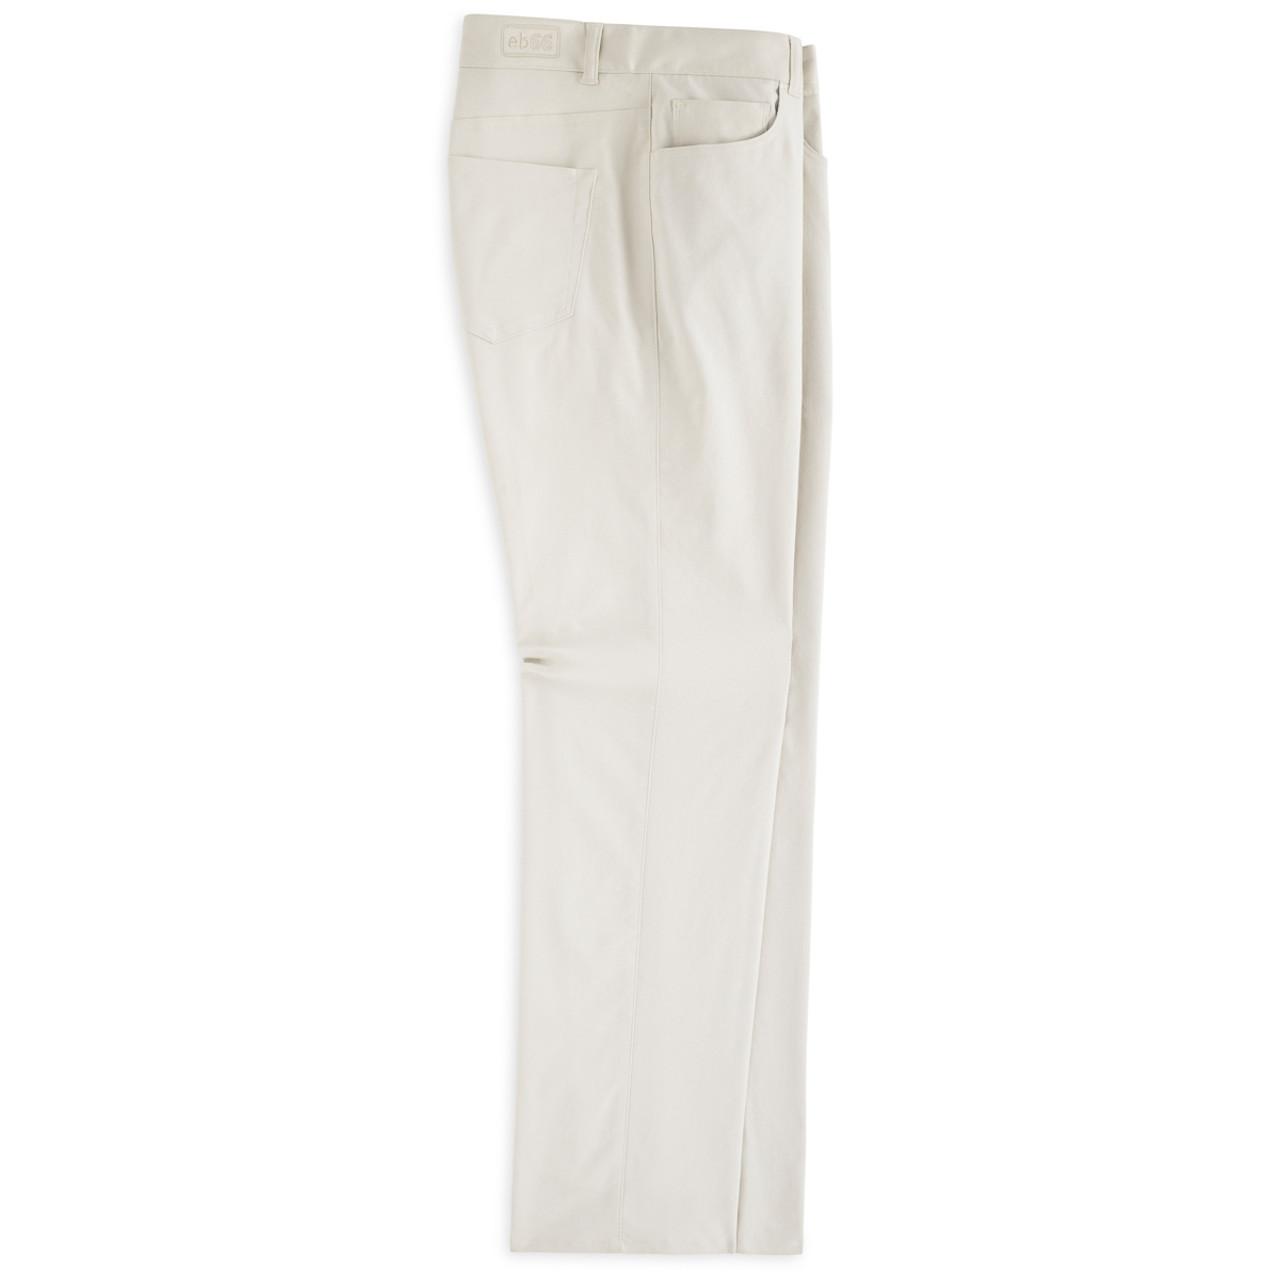 bbaa7a061d9b8d Peter Millar EB66 Performance 5 Pocket Pant - Stone - Nowells Clothiers